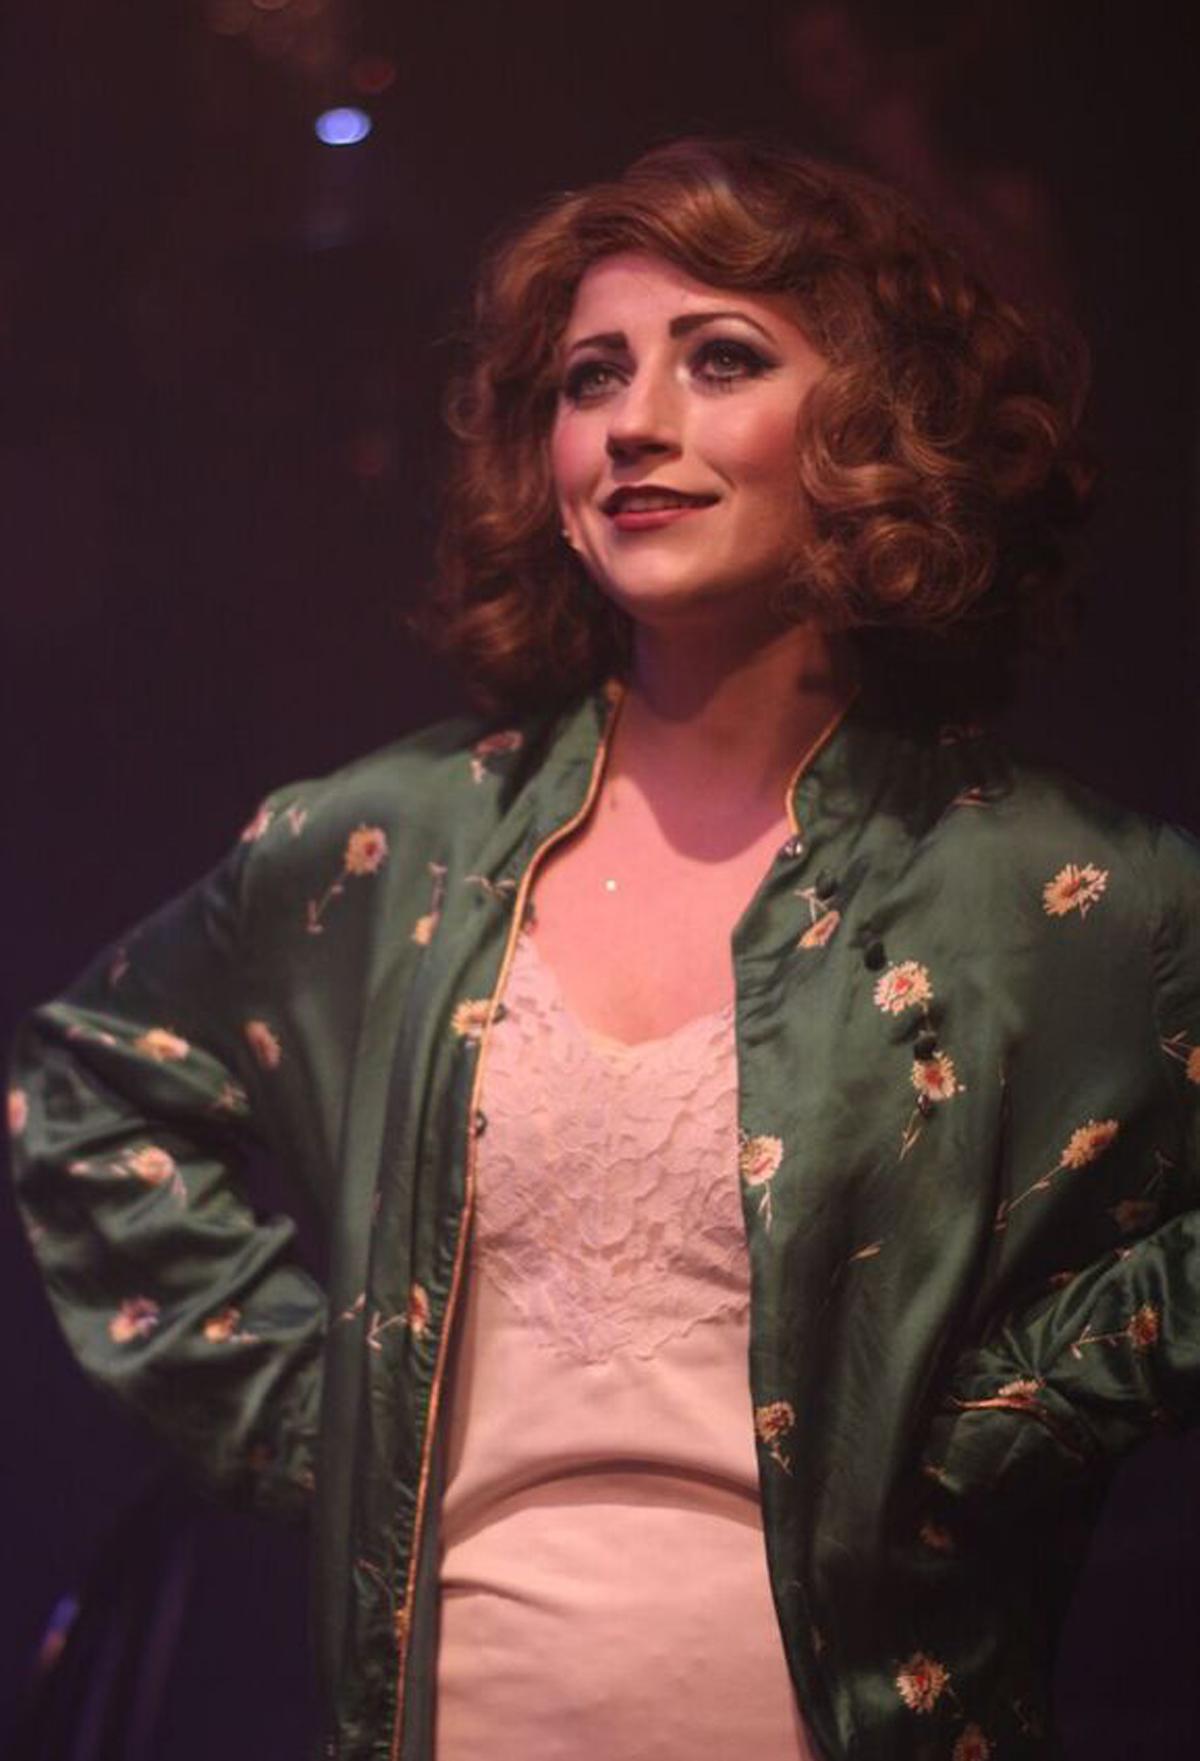 Sarah as Fraulein Kost in  Cabaret  (2015)